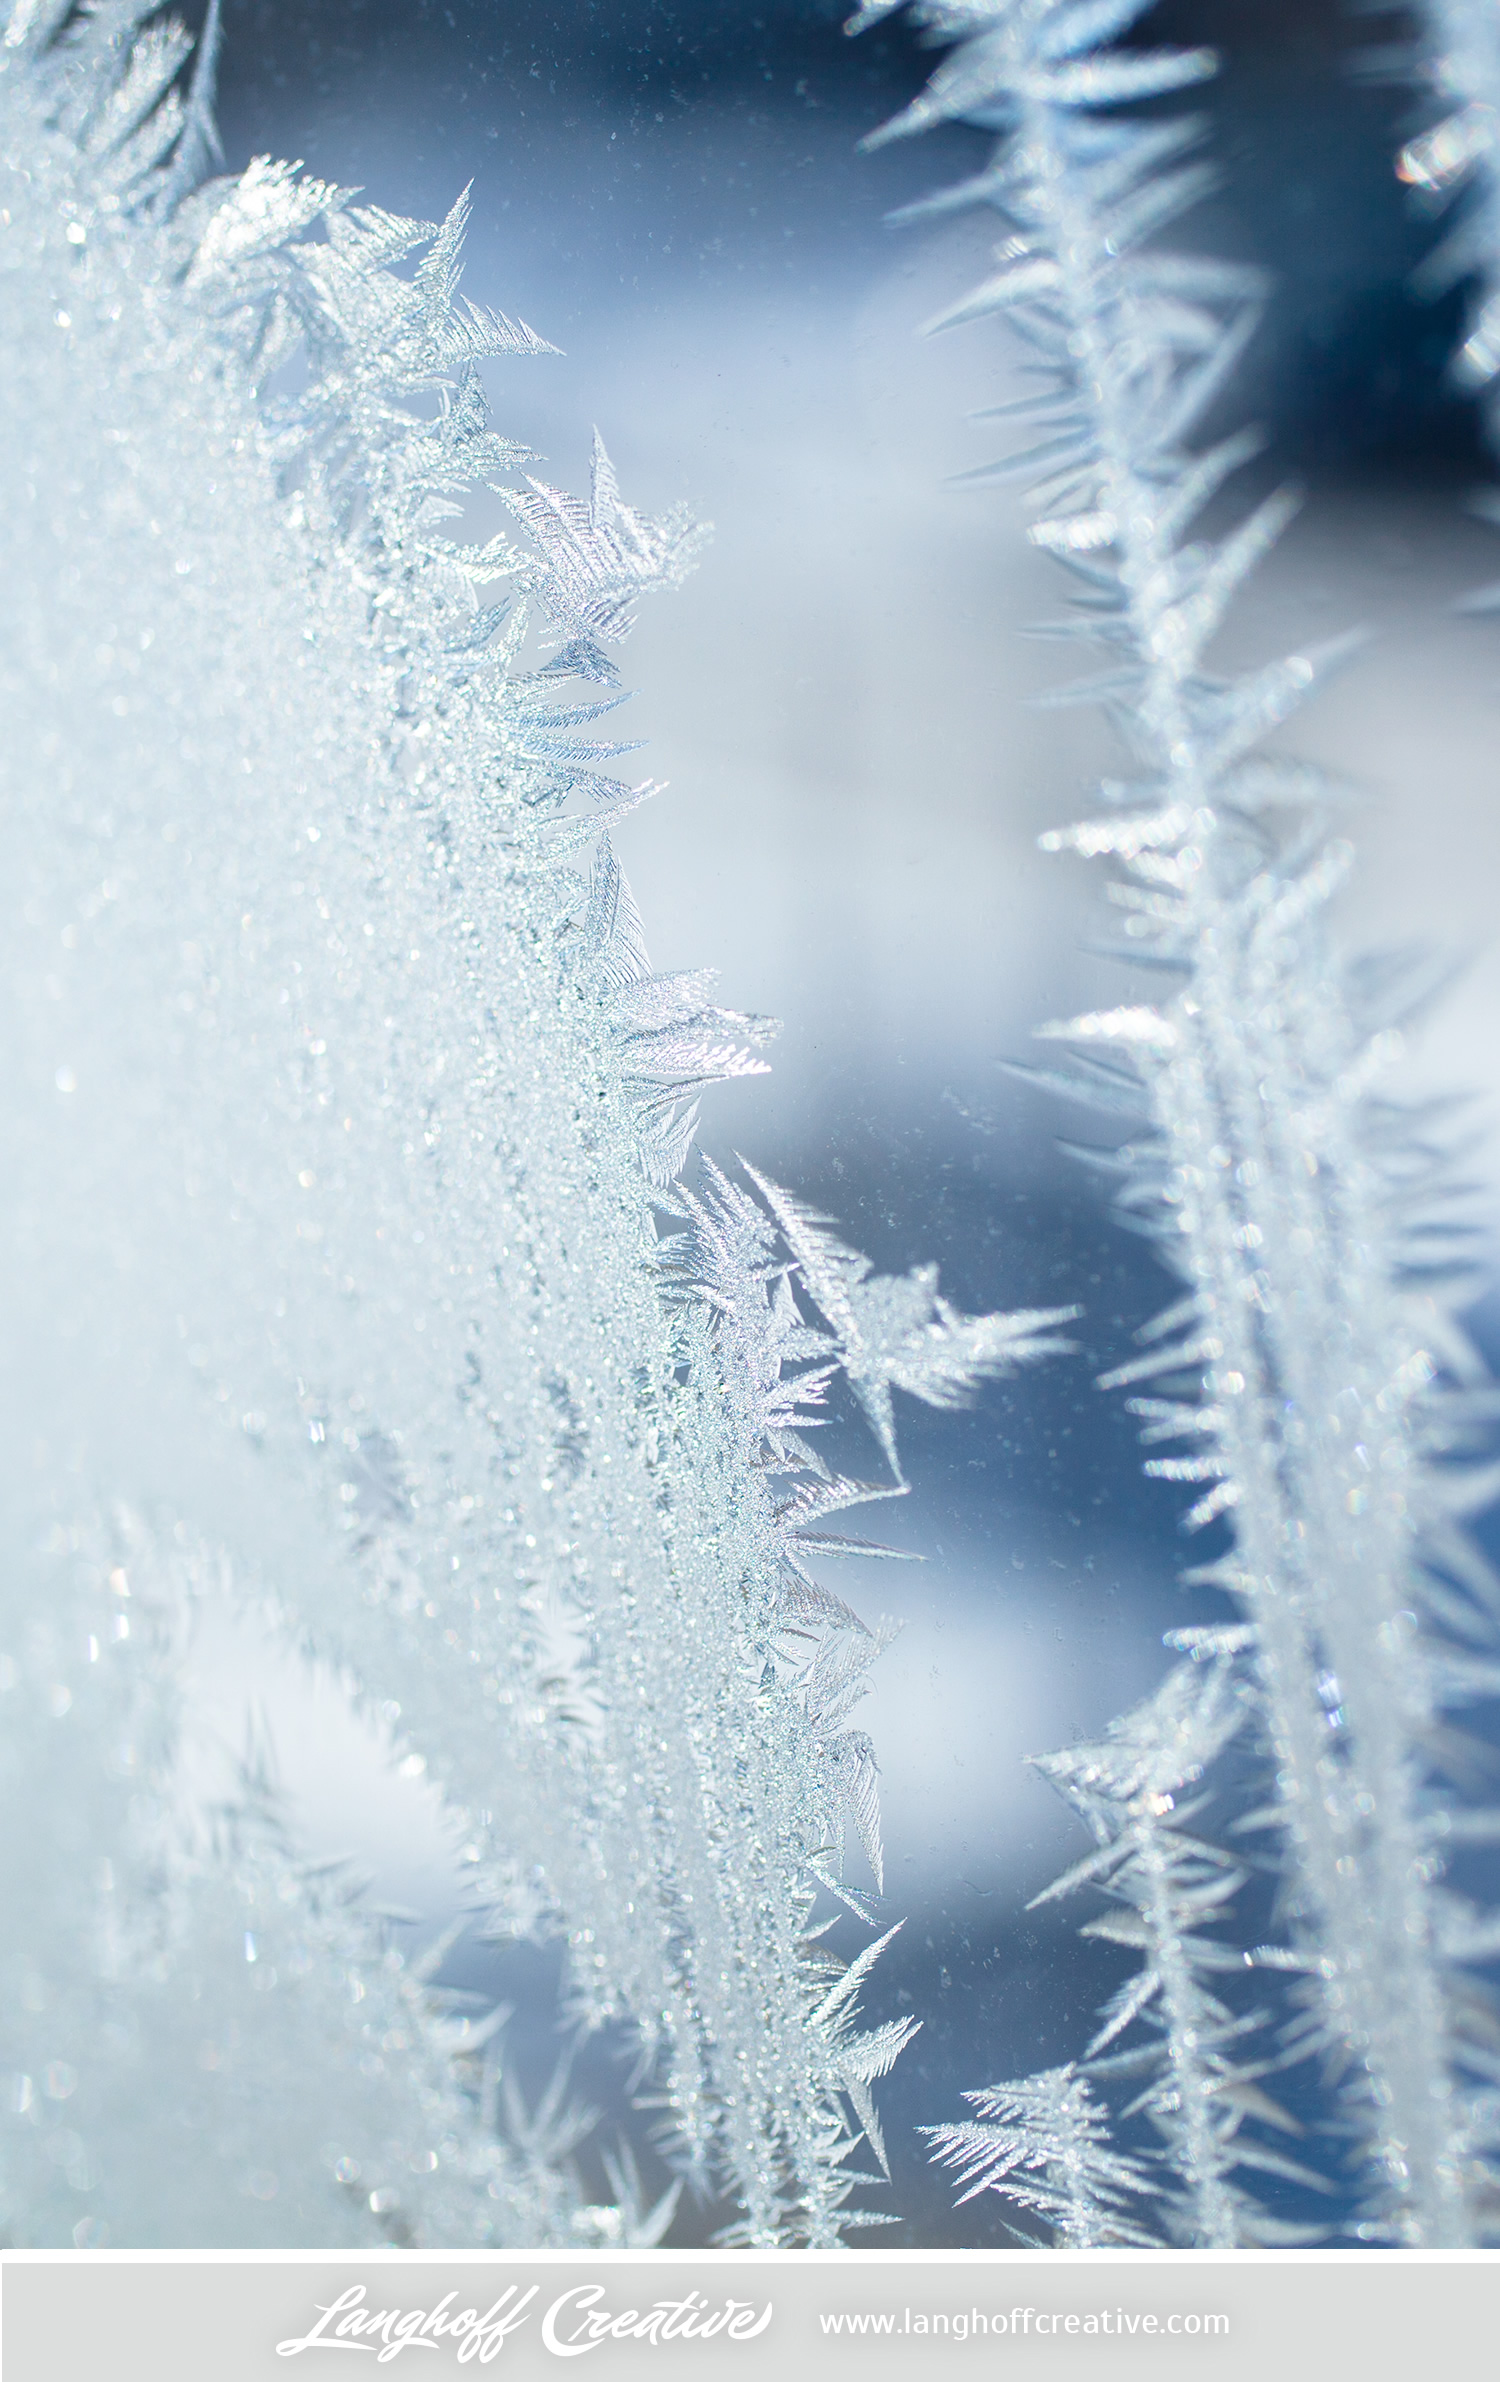 LanghoffCreative-frost-macro-photography_Jan06-2014-photo-2.jpg